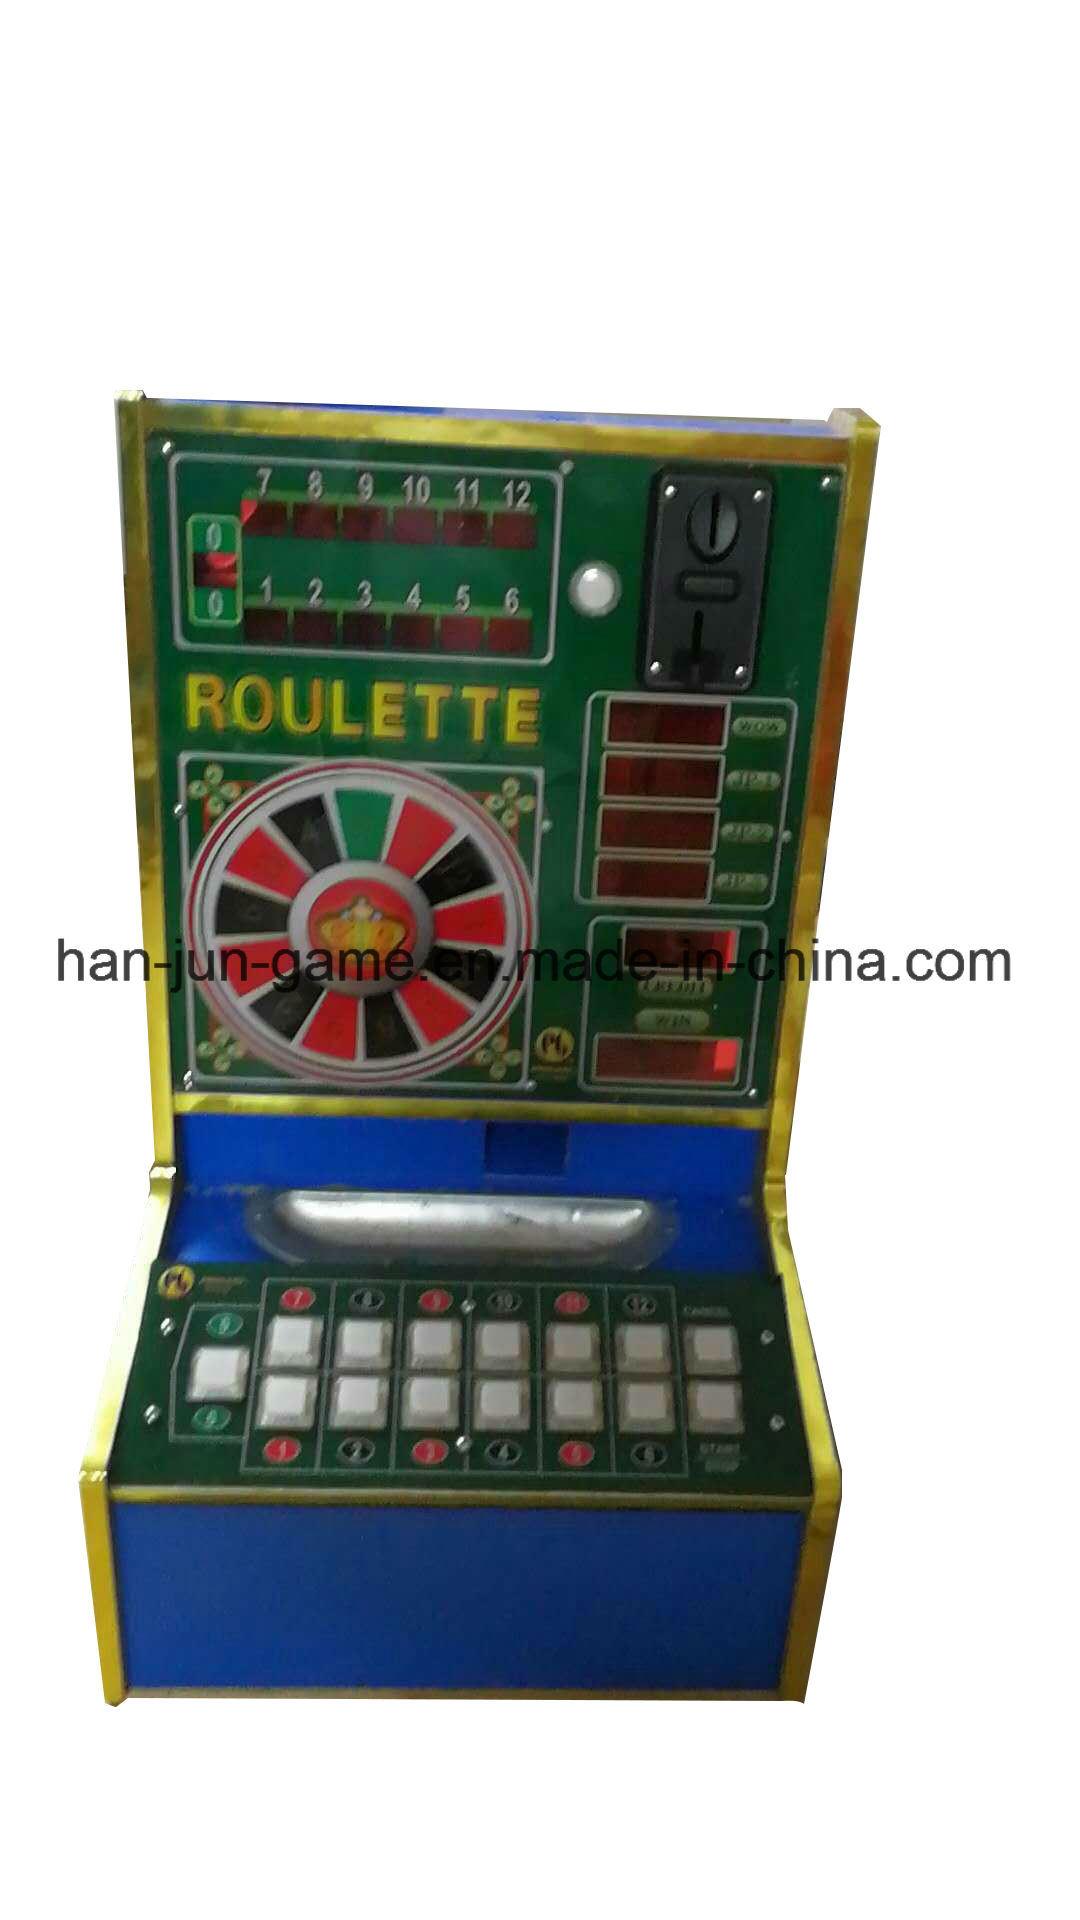 2007 february free online slot tournament